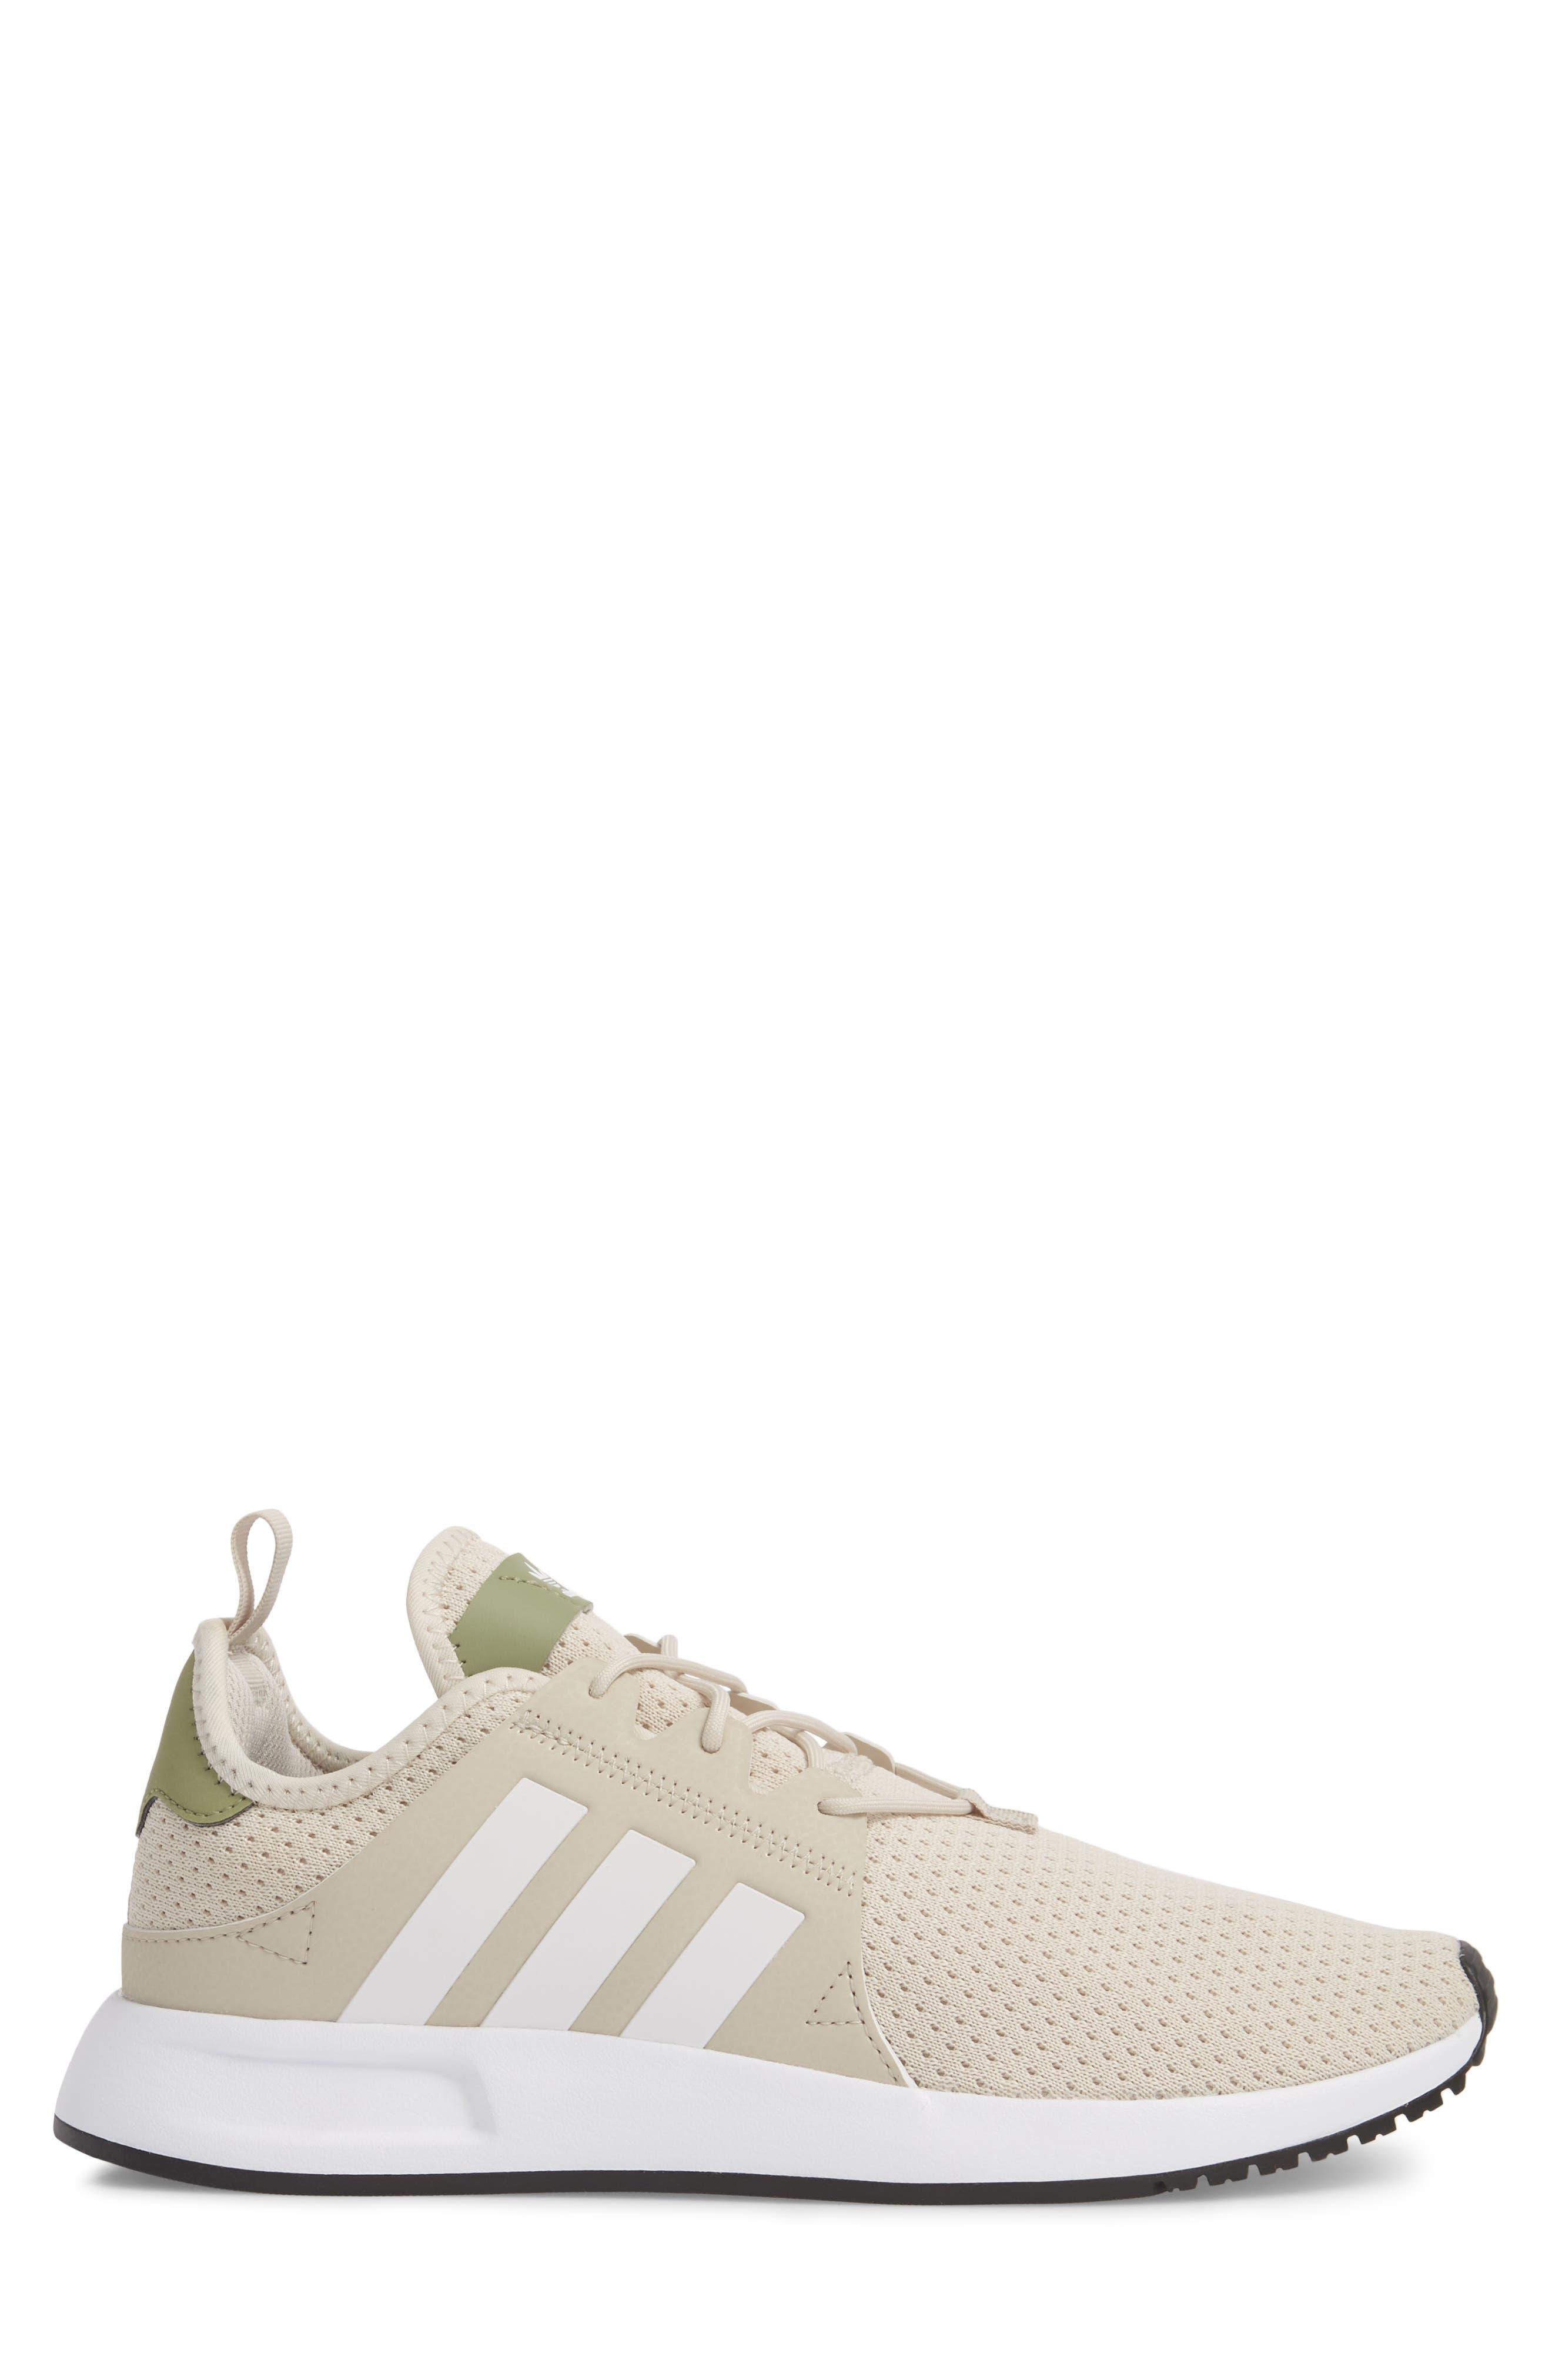 X_PLR Sneaker,                             Alternate thumbnail 3, color,                             Brown/ White / Trace Cargo